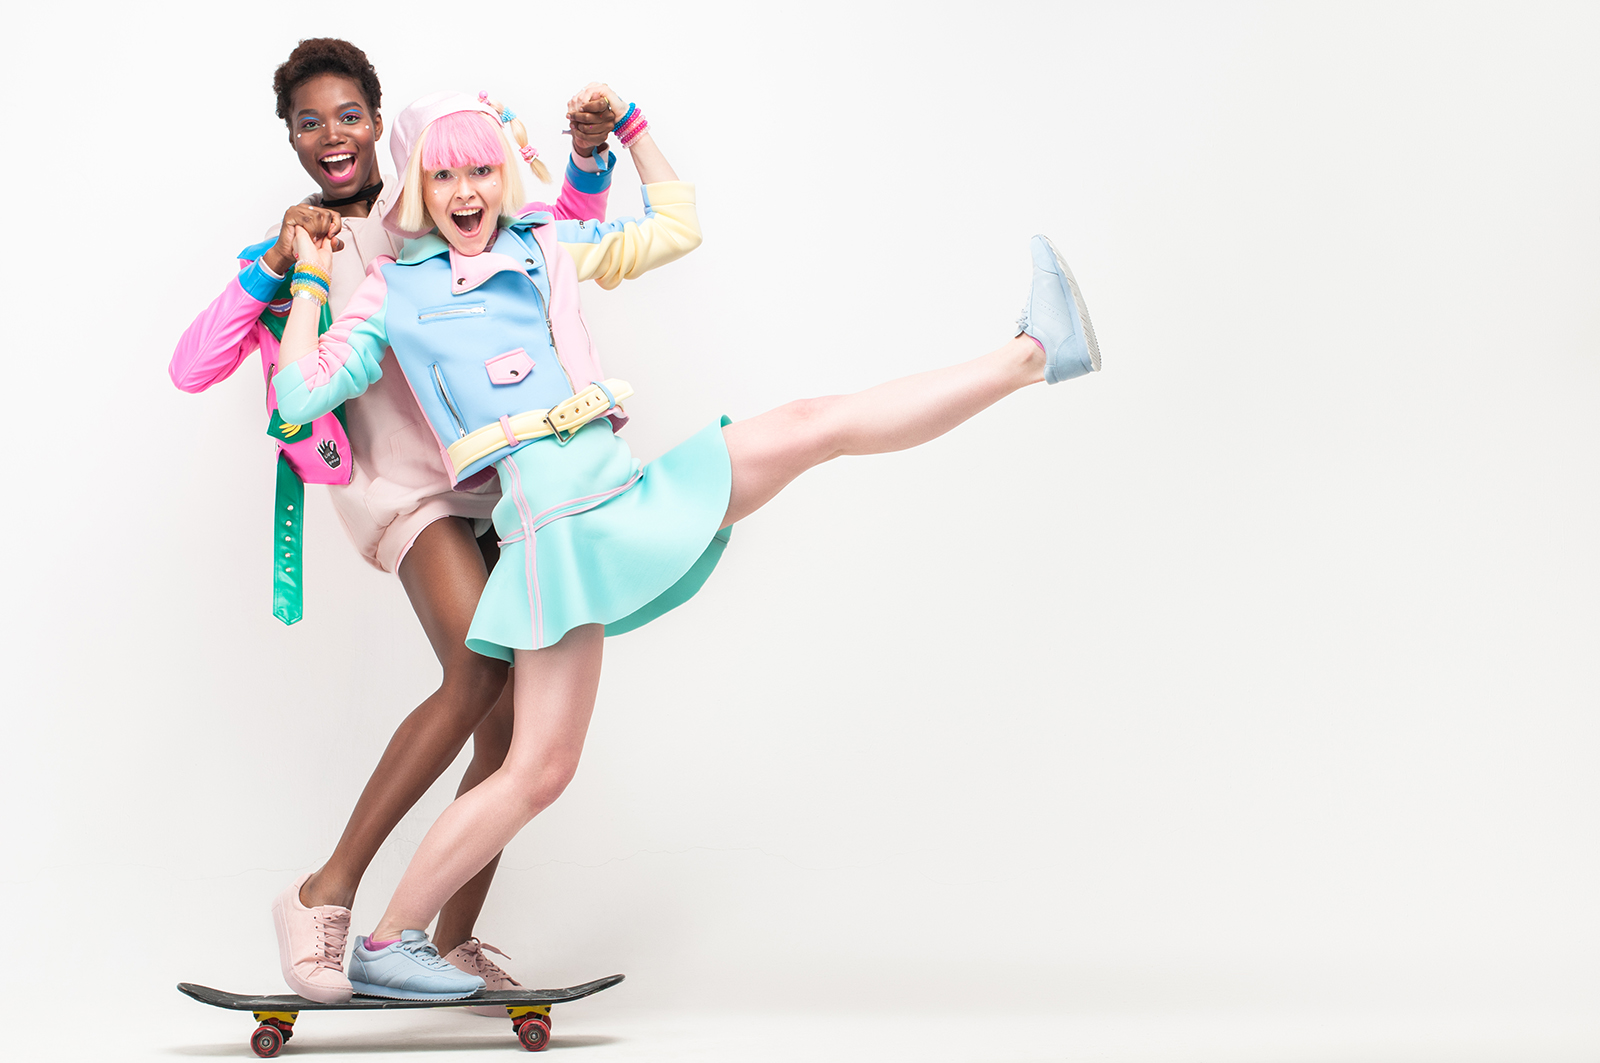 From left to right: Jacket: #LenaGolova Hoody: Monki Skirt: #LenaGolova Choker: Diva Pink sneakers: H&M Jacket: #LenaGolova Hoody: H&M Skirt: #LenaGolova Choker: Accessorize and #LenaGolova Baseball cap: #LenaGolova Socks: Nike Blue sneakers: H&M